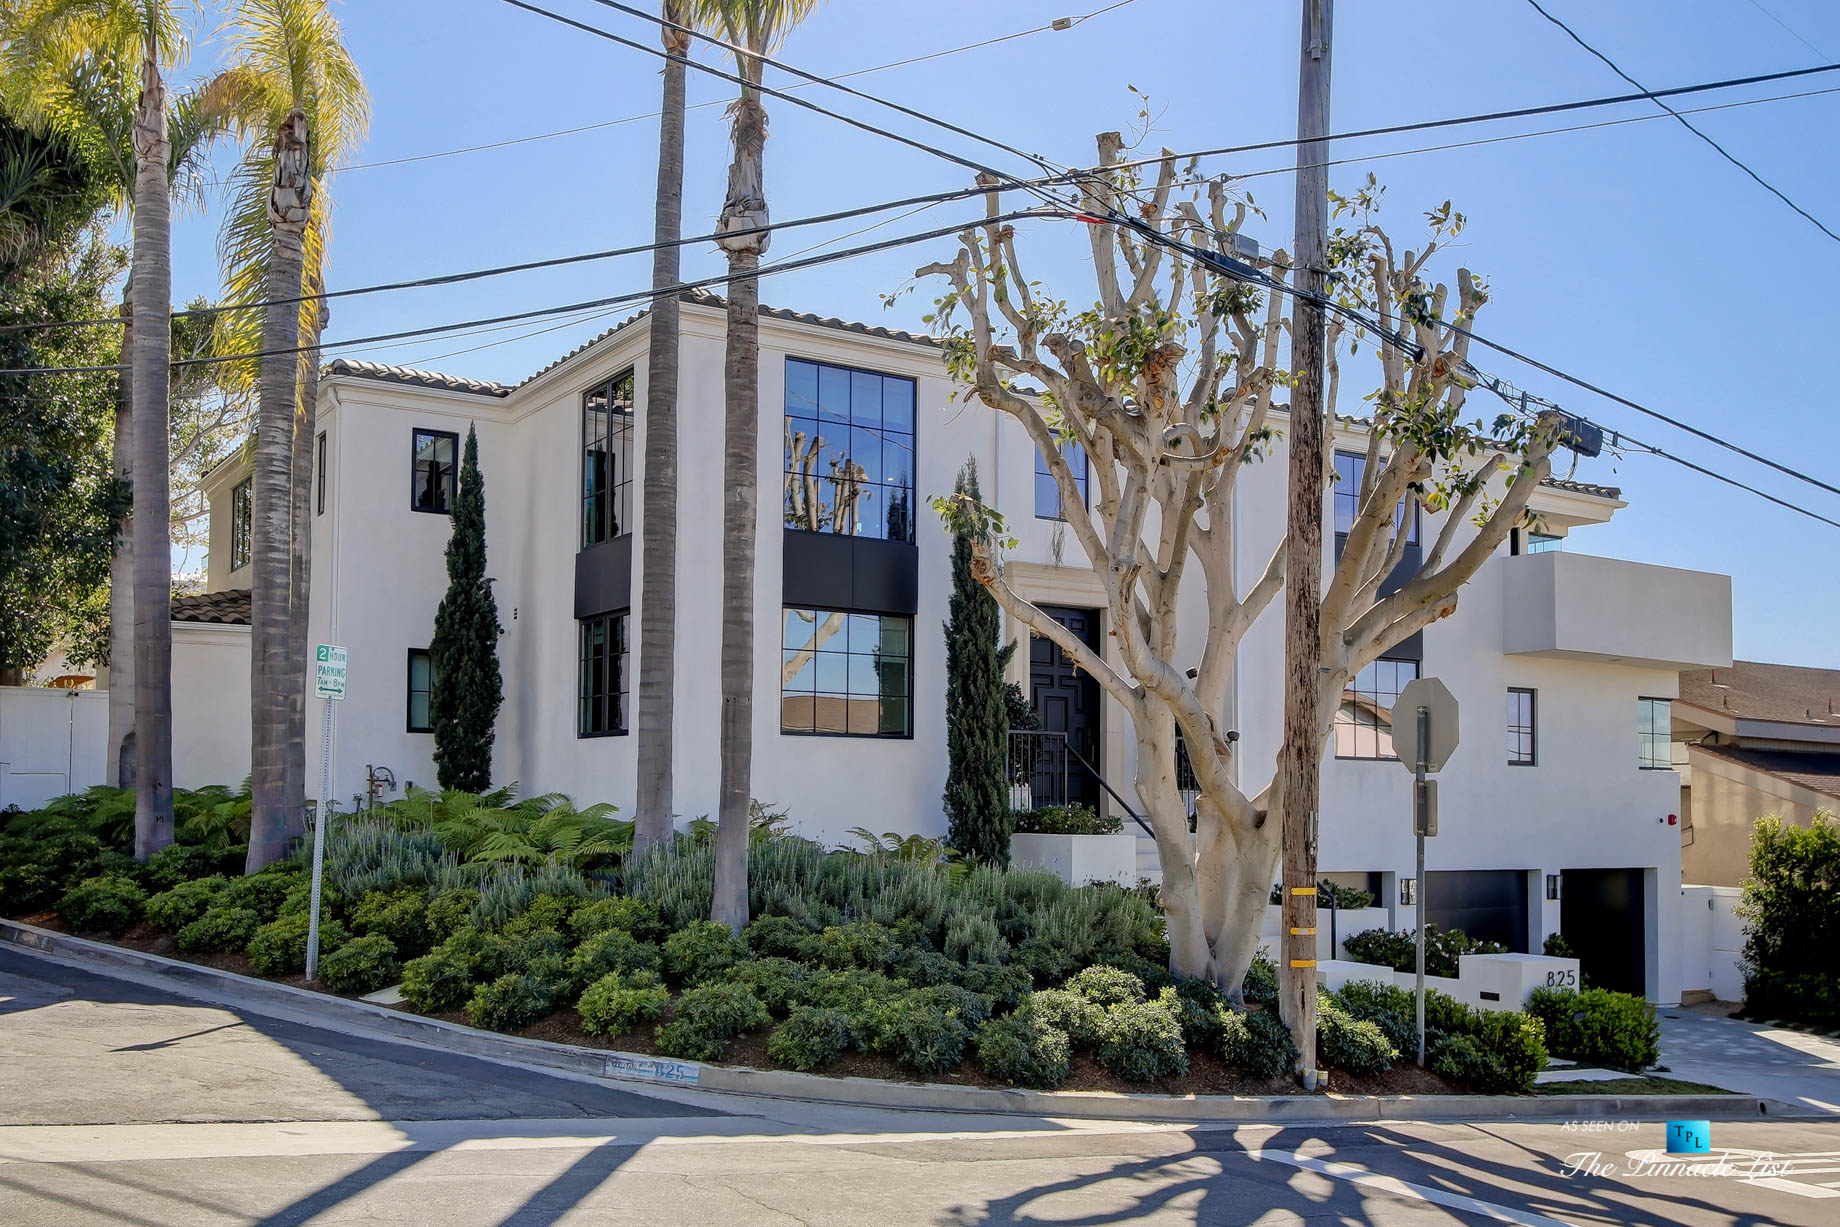 825 Highview Ave, Manhattan Beach, CA, USA – Luxury Real Estate – Modern Spanish Home